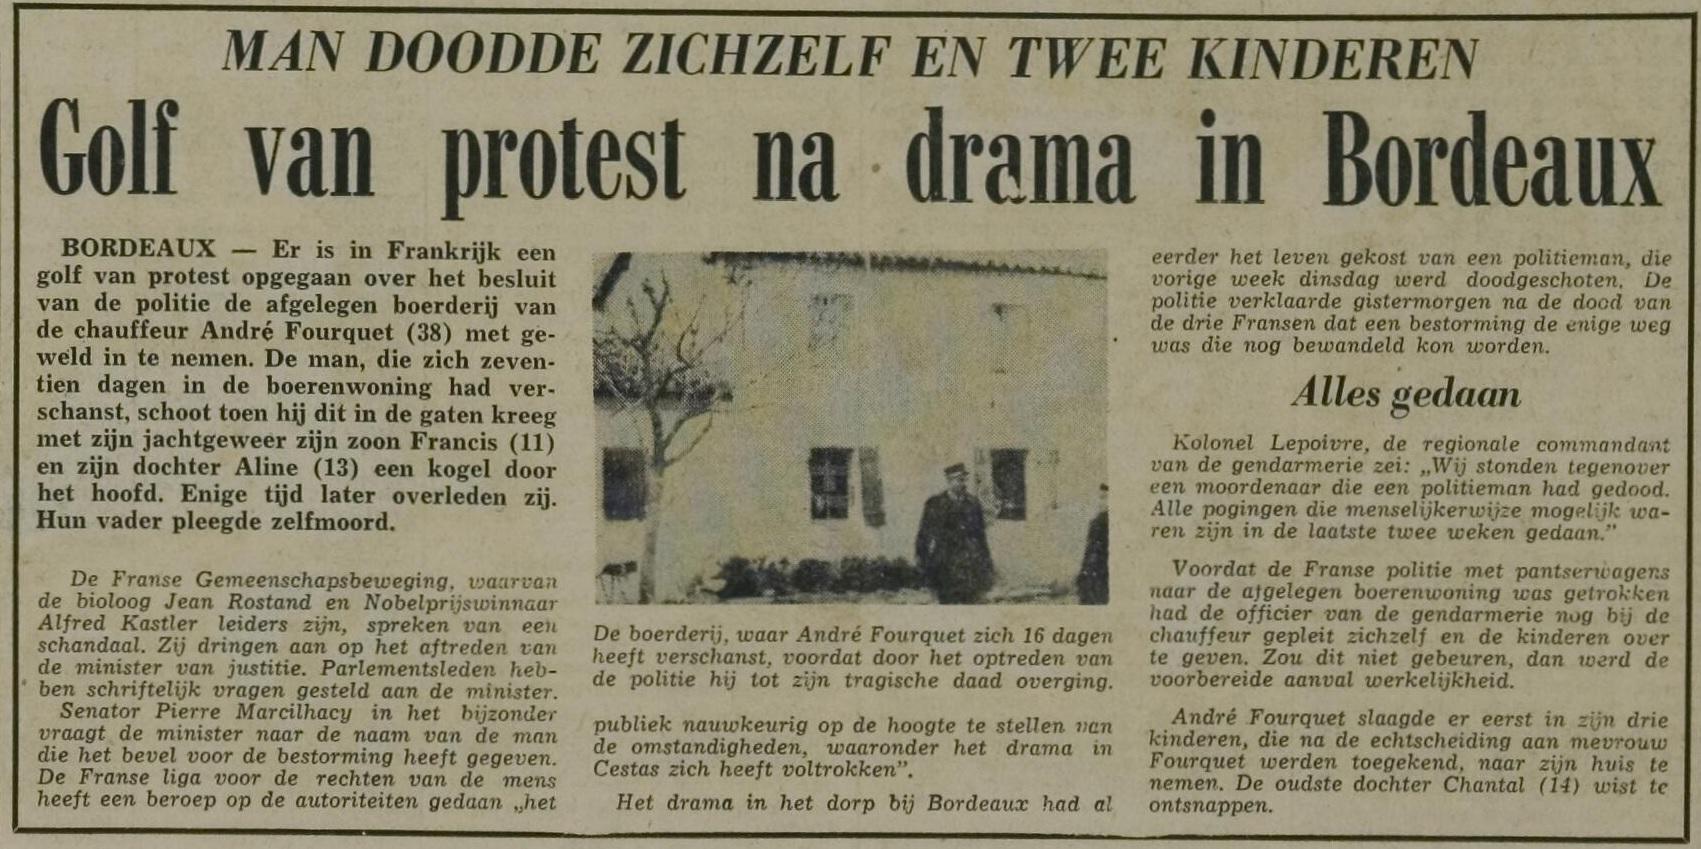 Nieuwe Leidse Courant, 18/02/1969, p. 5